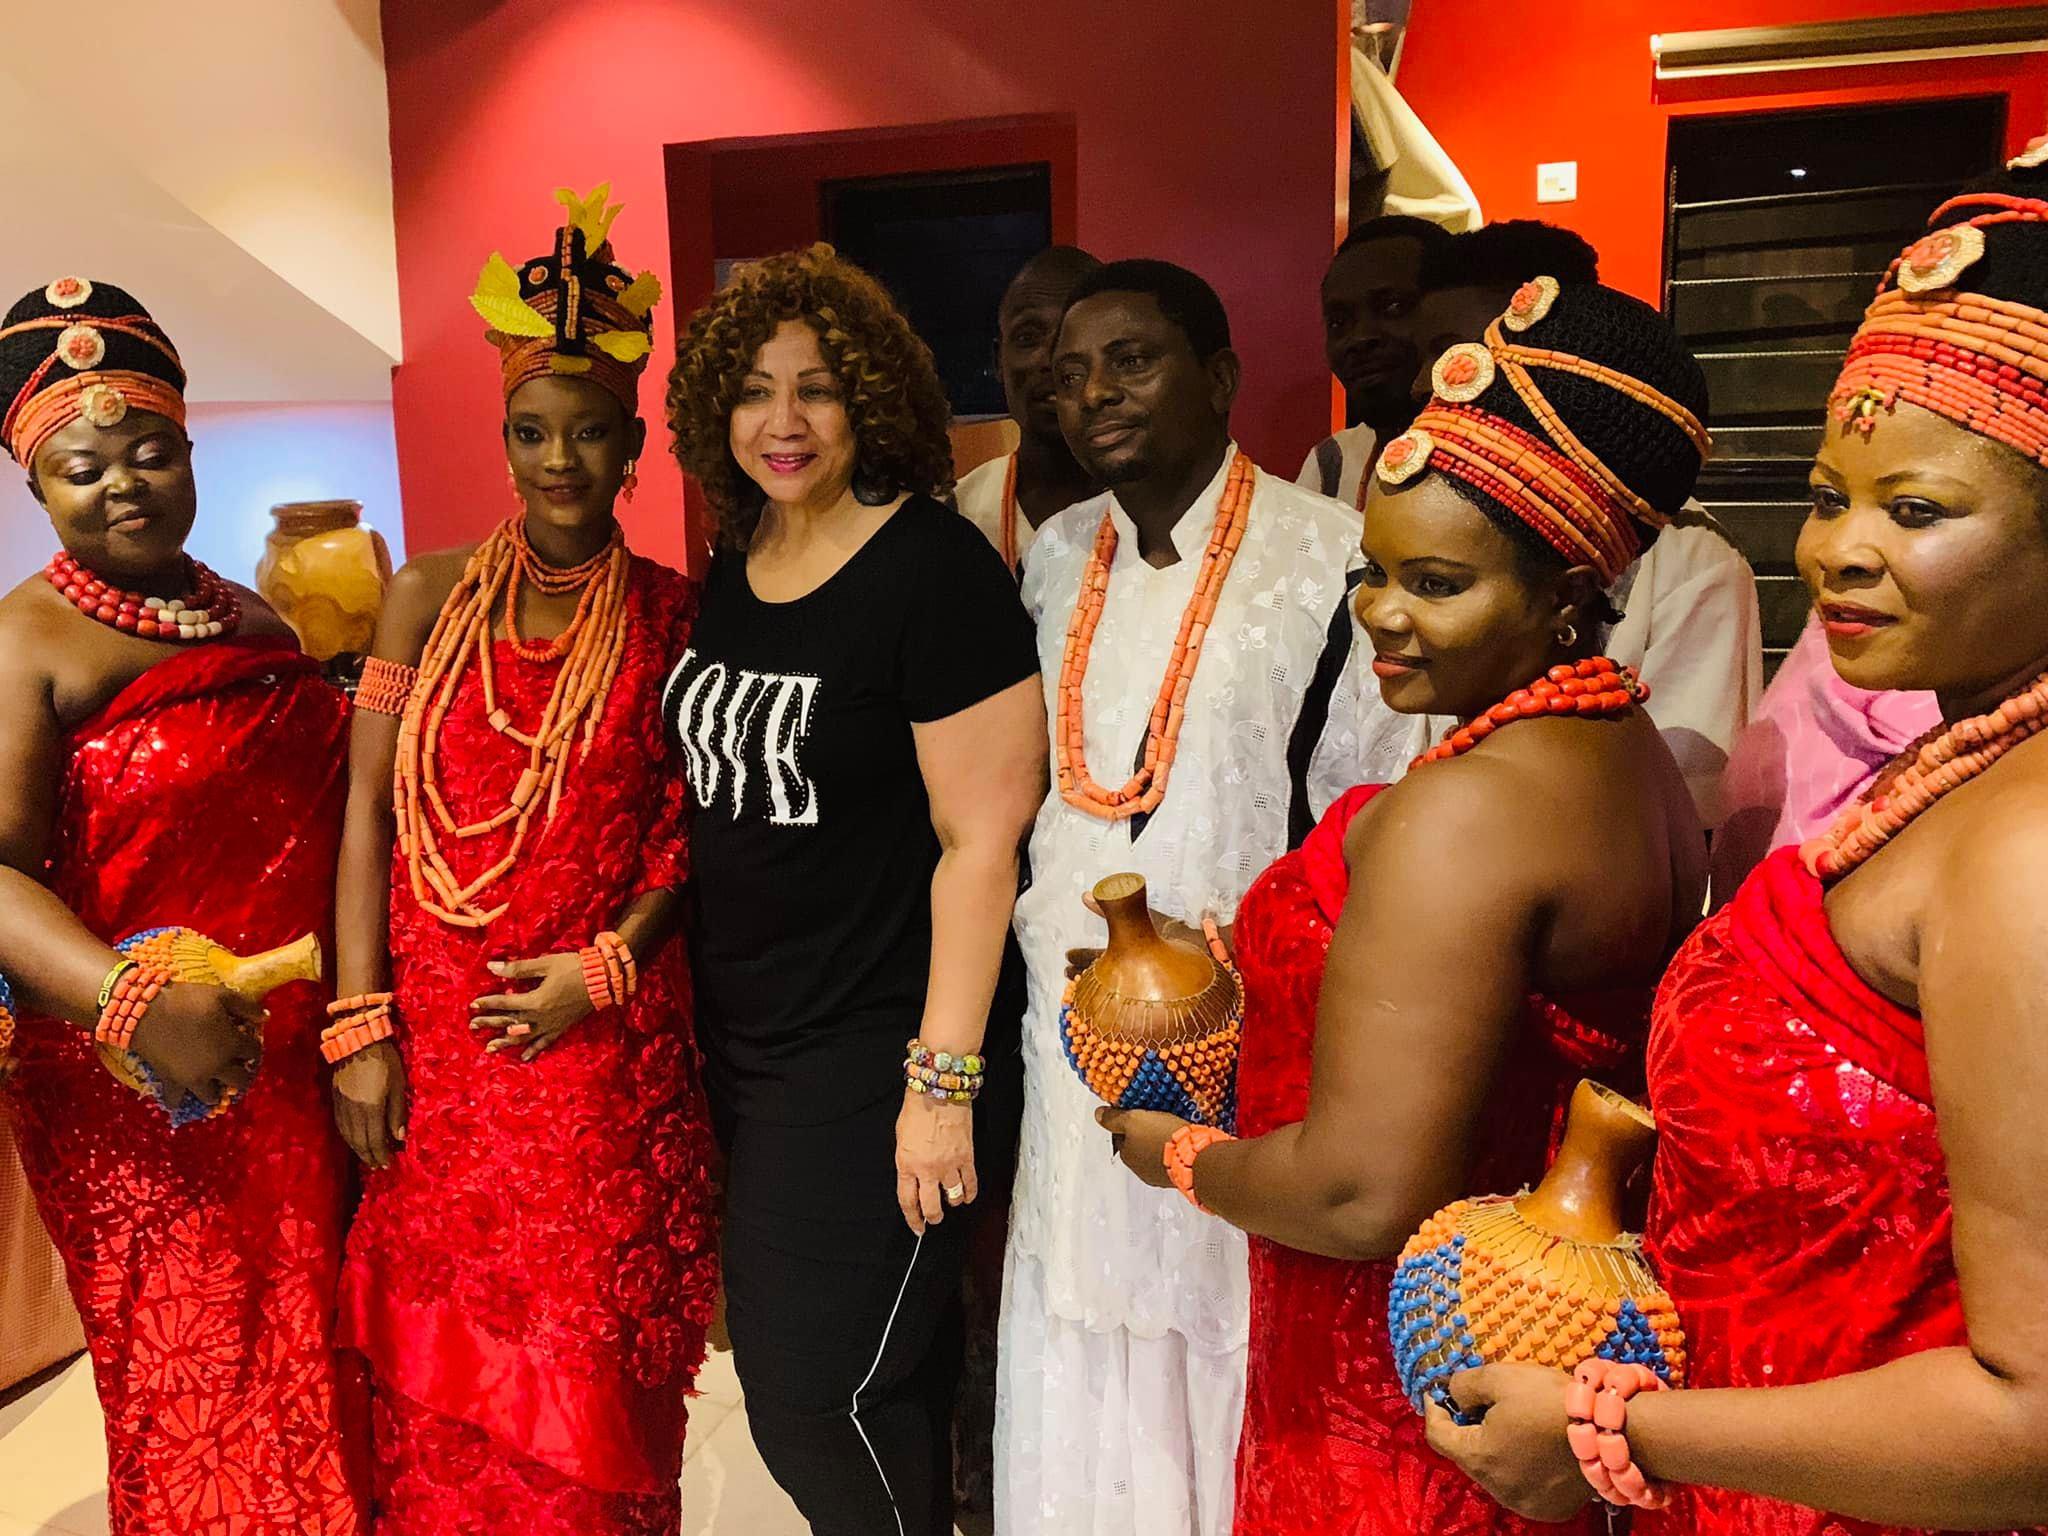 Lorie James Nigerian Oba visit picture 5.jpg